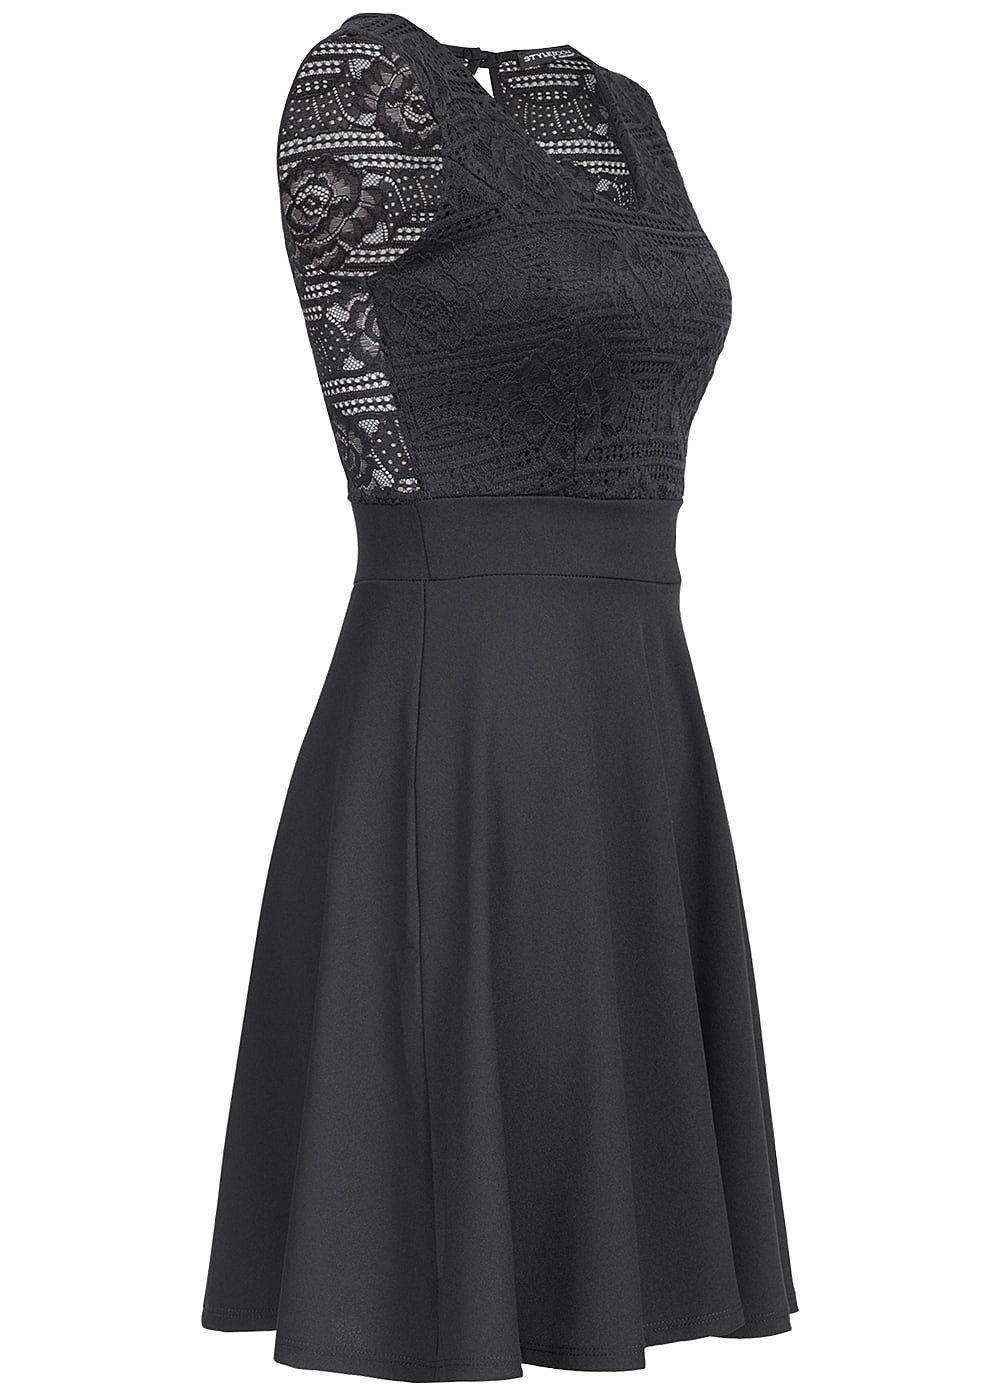 styleboom fashion damen mini kleid spitze oben brustpads schwarz 77onlineshop. Black Bedroom Furniture Sets. Home Design Ideas